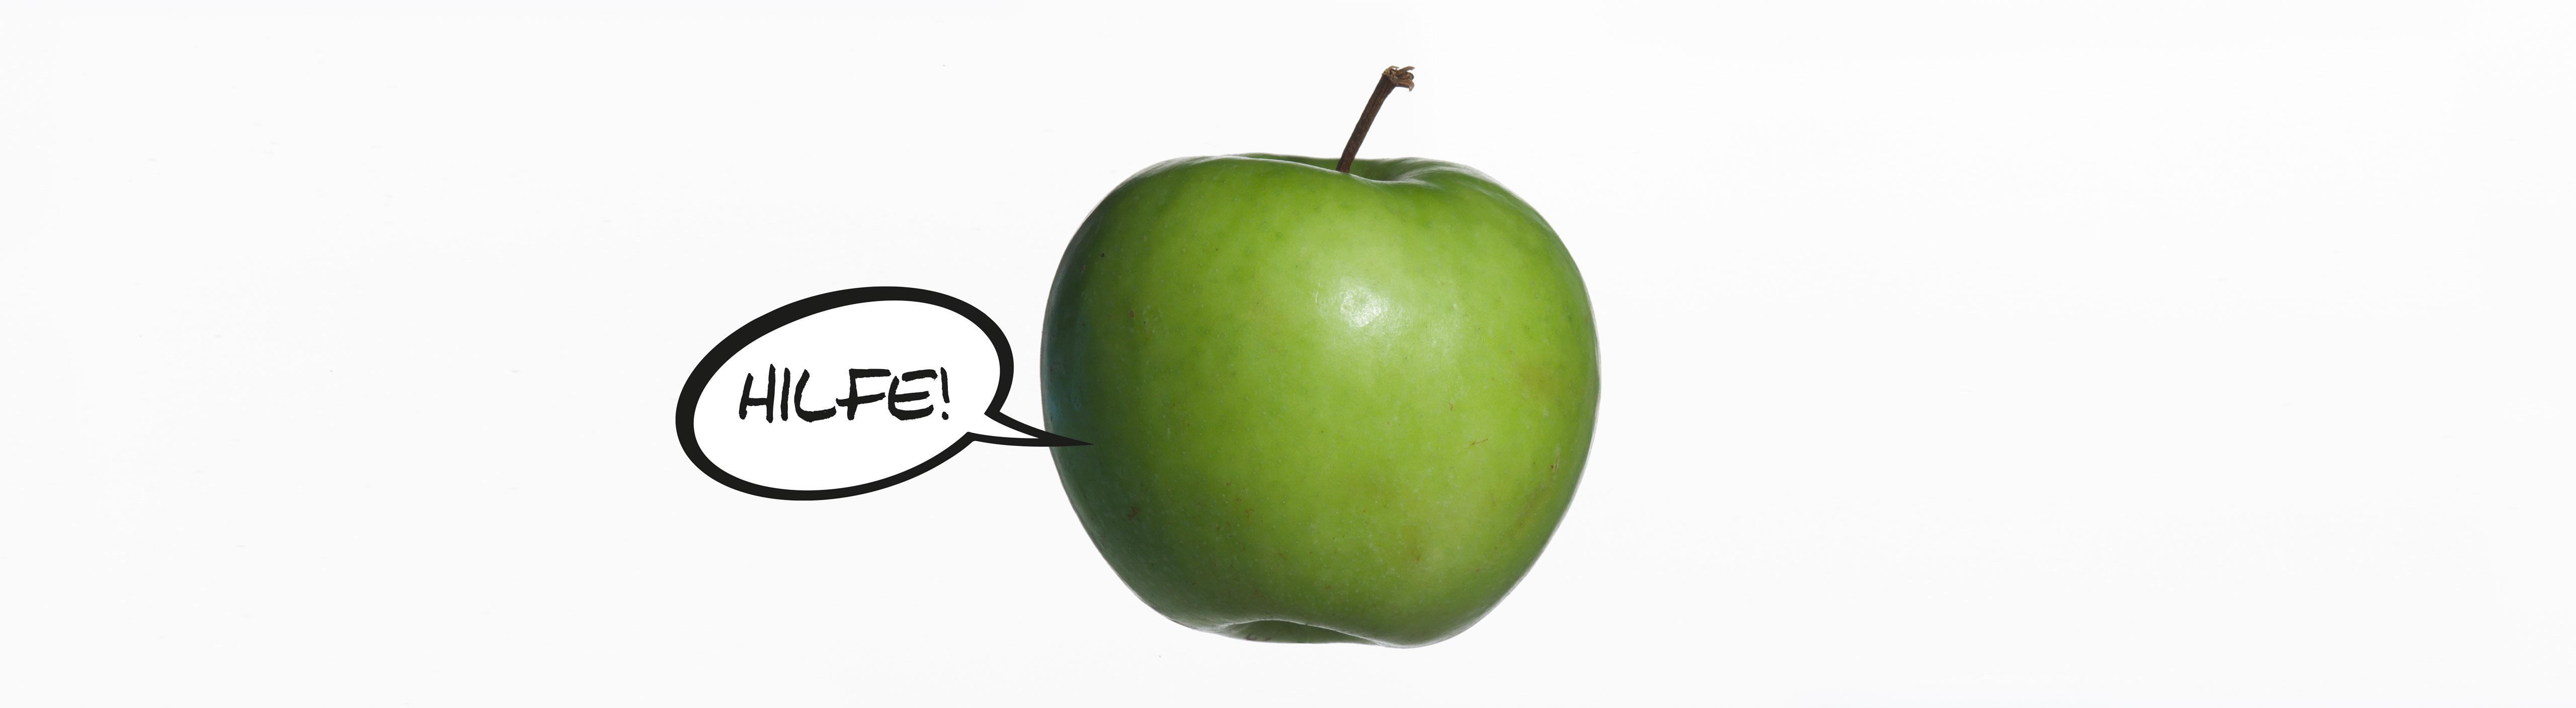 Apple Hilfe Hamburg